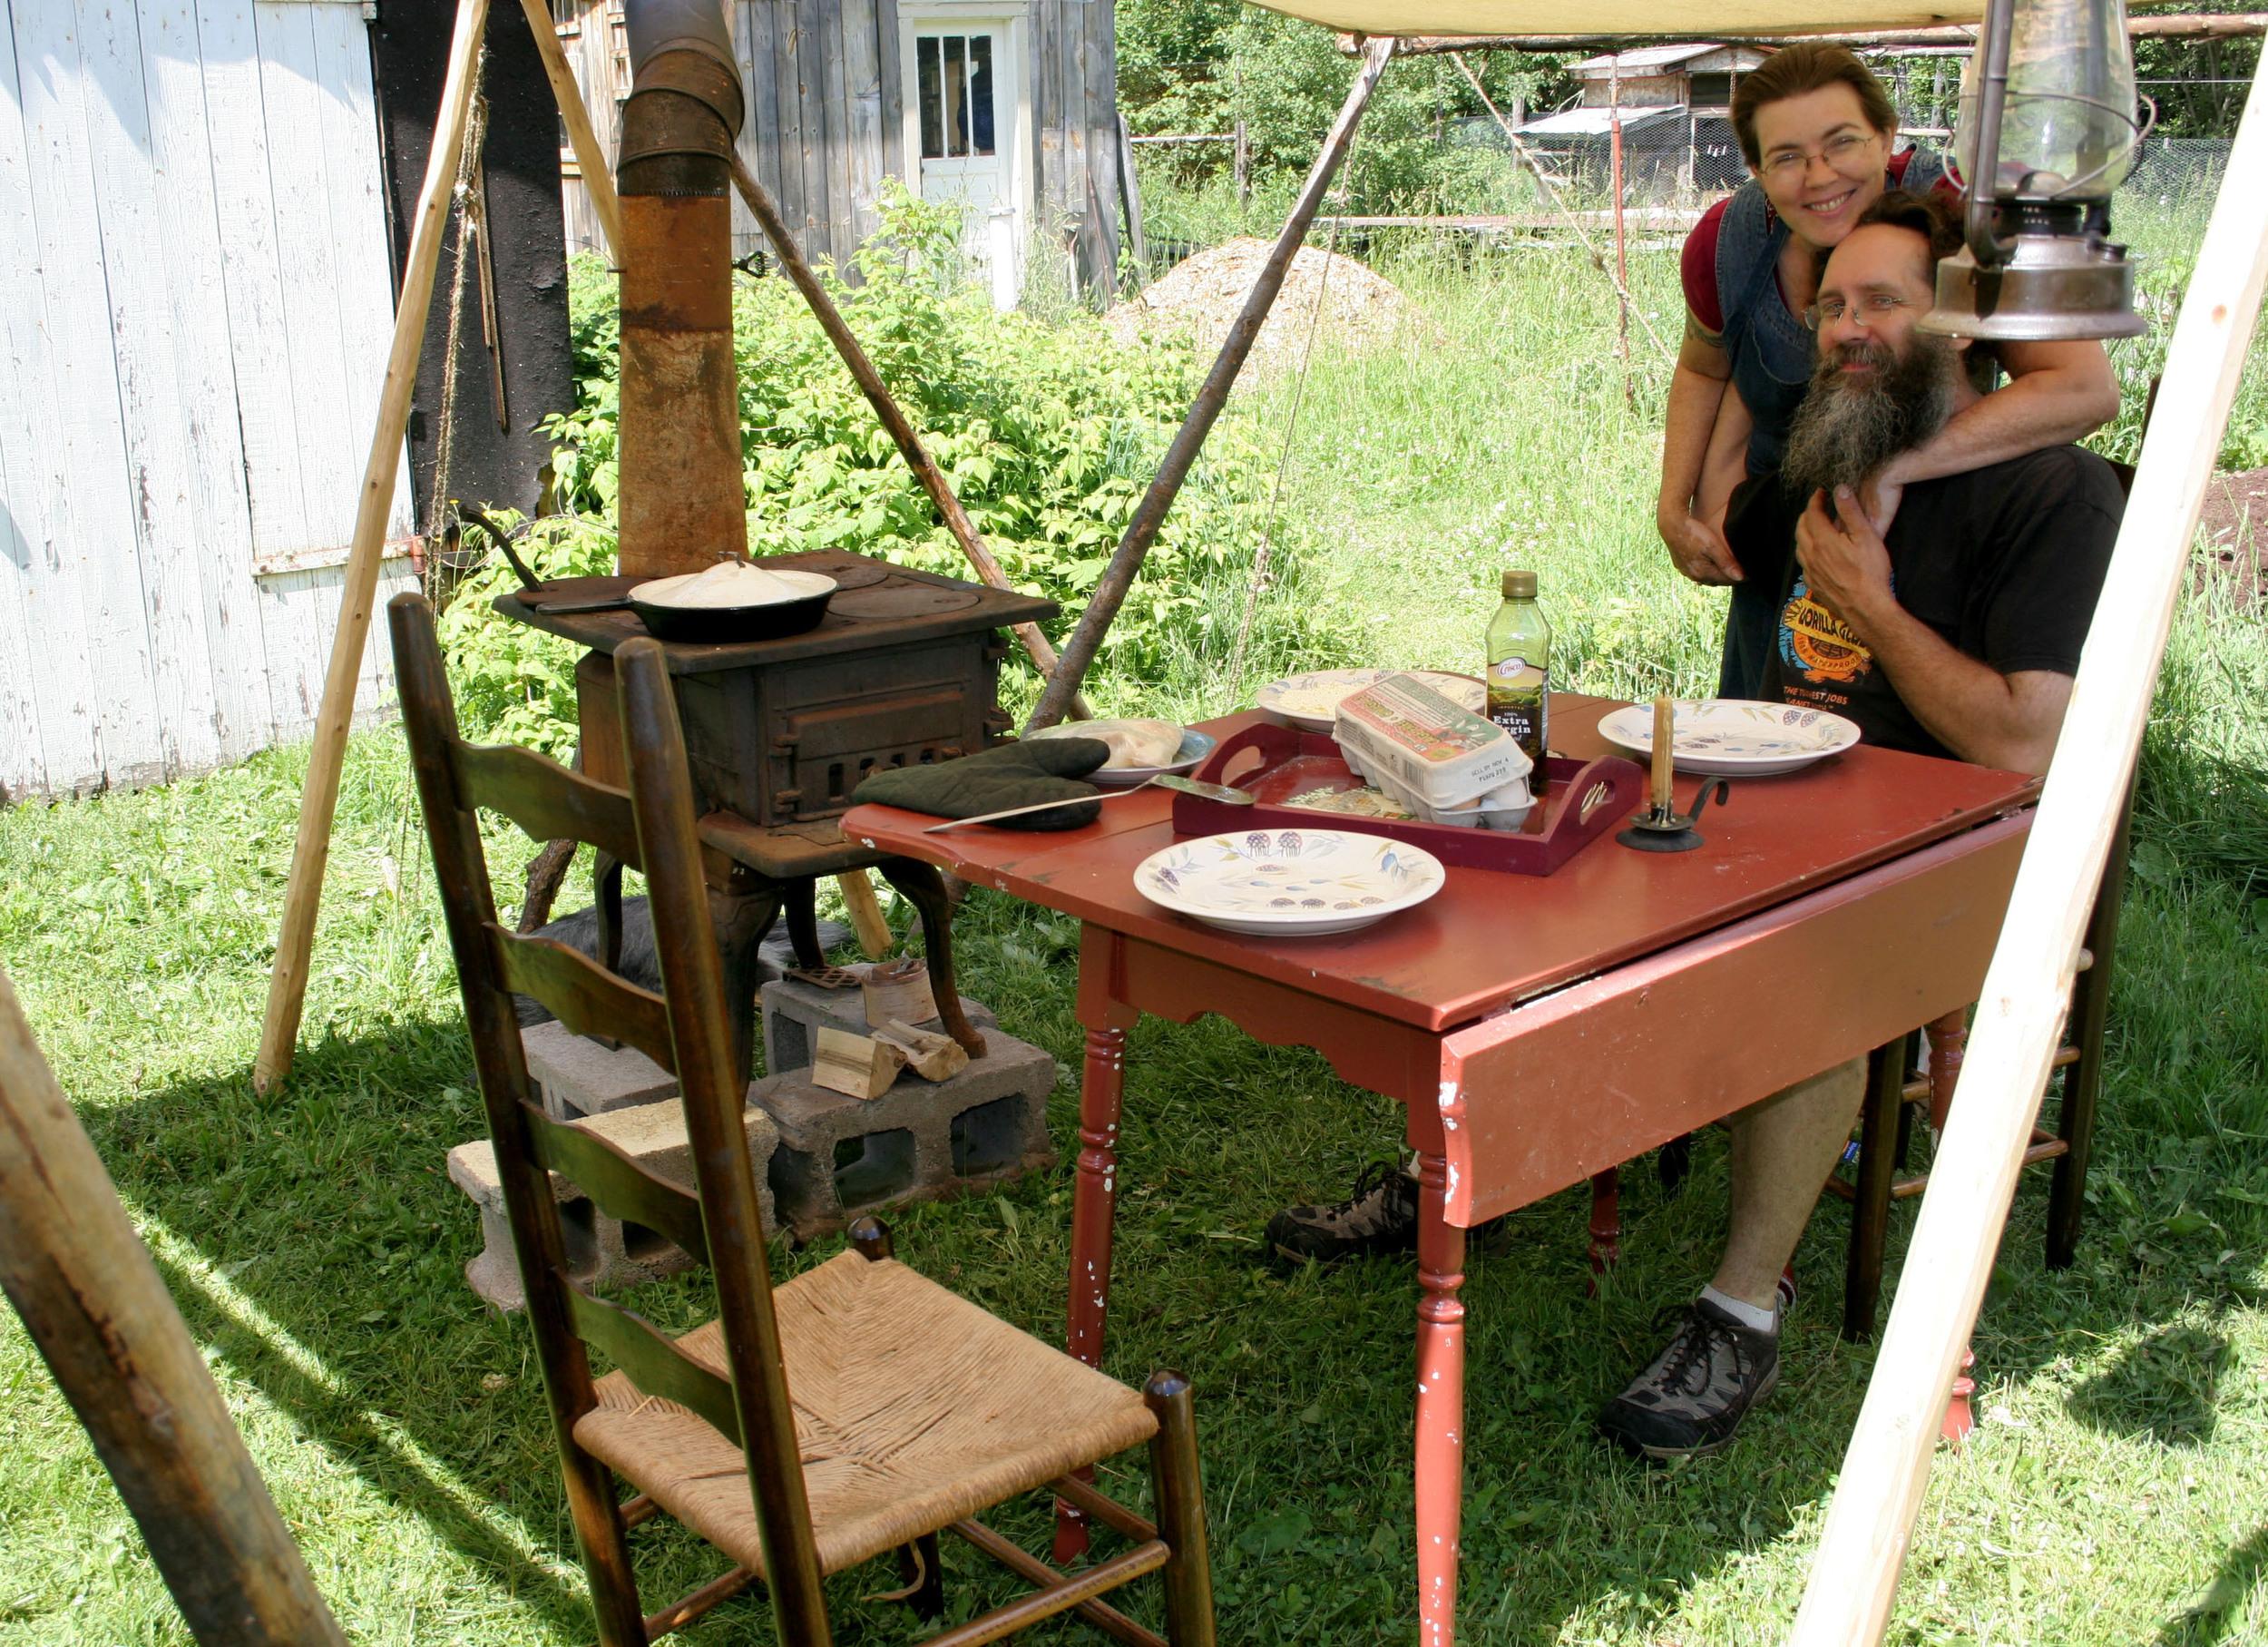 Summer Kitchen: Dan Roesinger and Saga Erickson of Stark Raven Studios